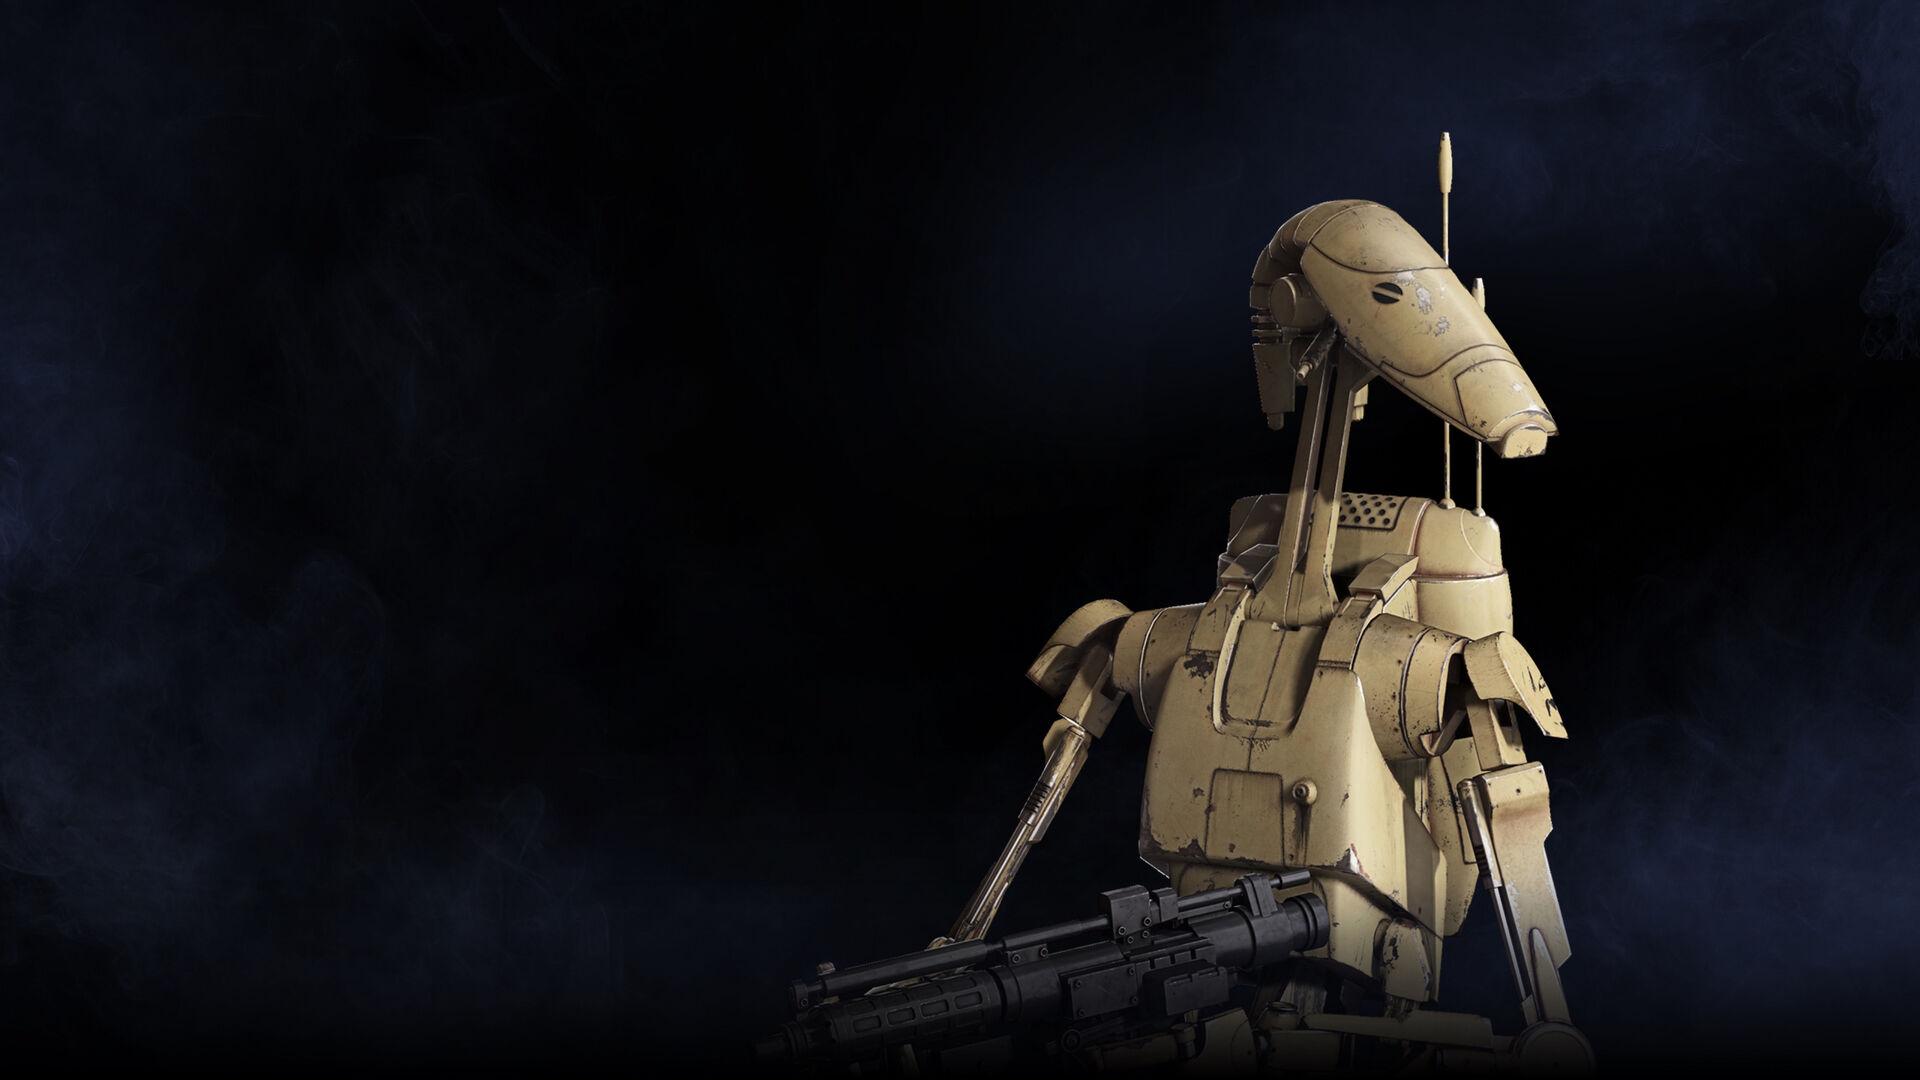 Star Wars Battlefront 2 Background: 1920x1080 Assault Class In Star Wars Battlefront 2 Laptop